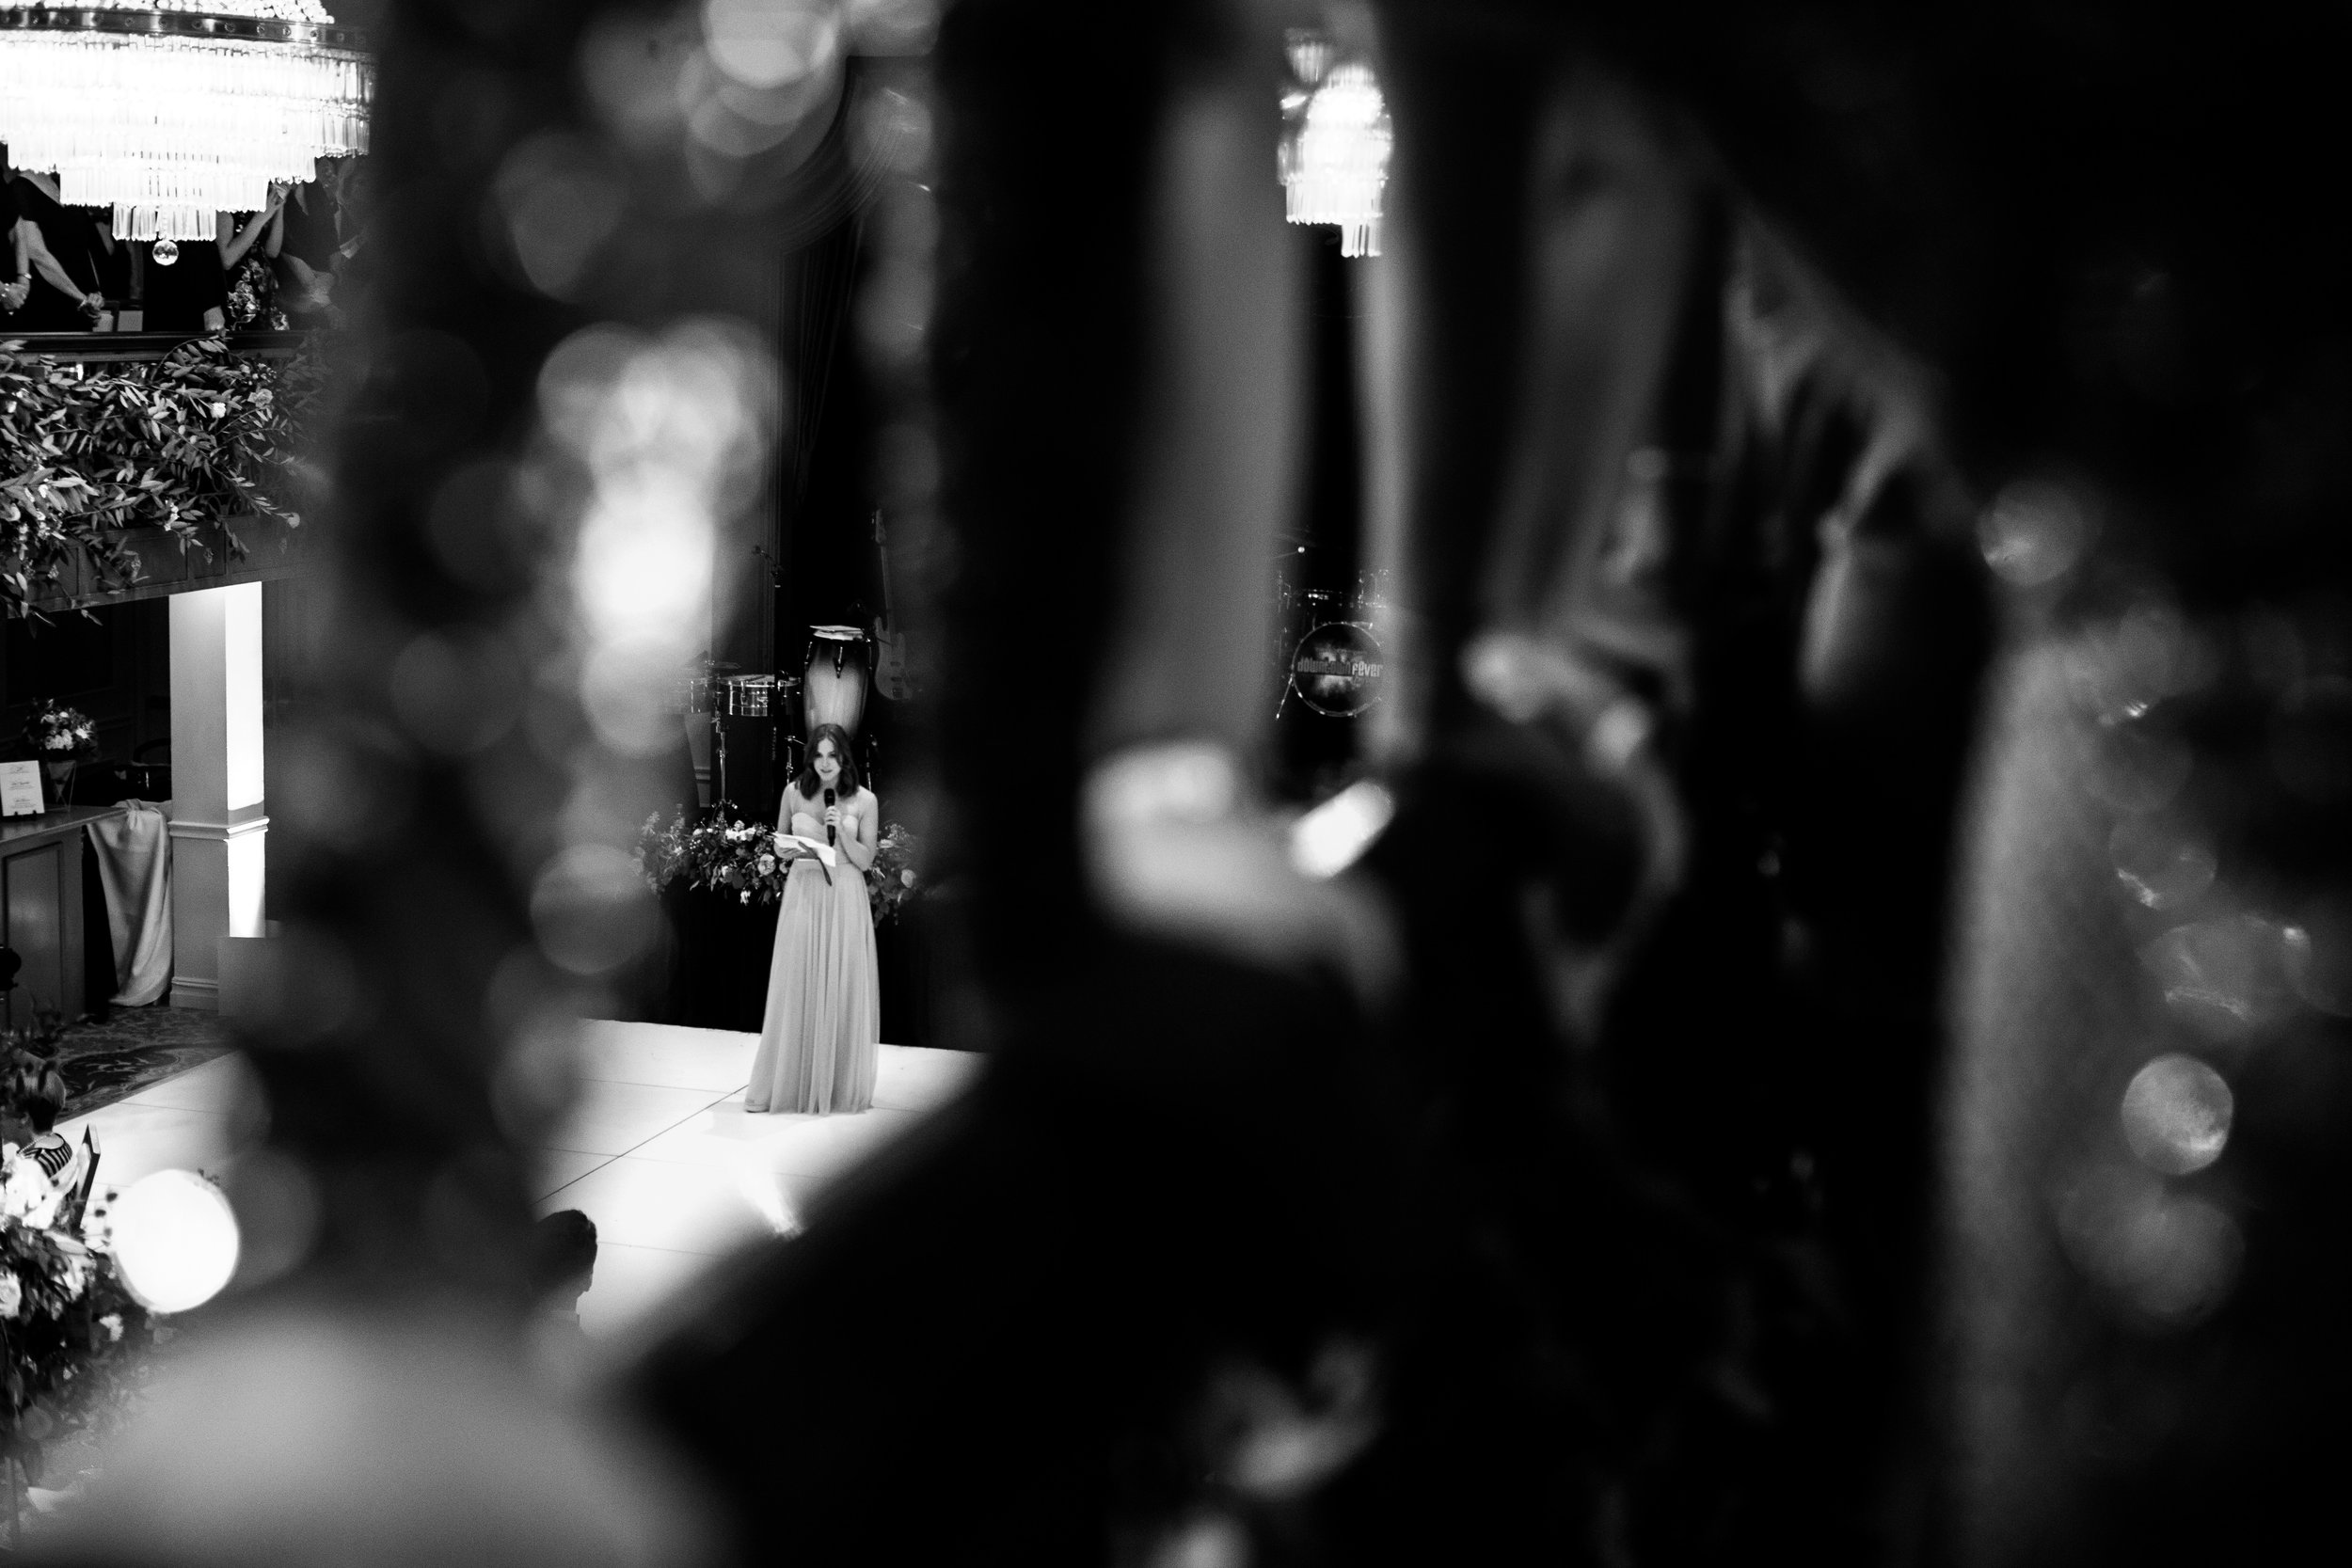 st-anthony-hotel-wedding-photography-10144san-antonio.JPG